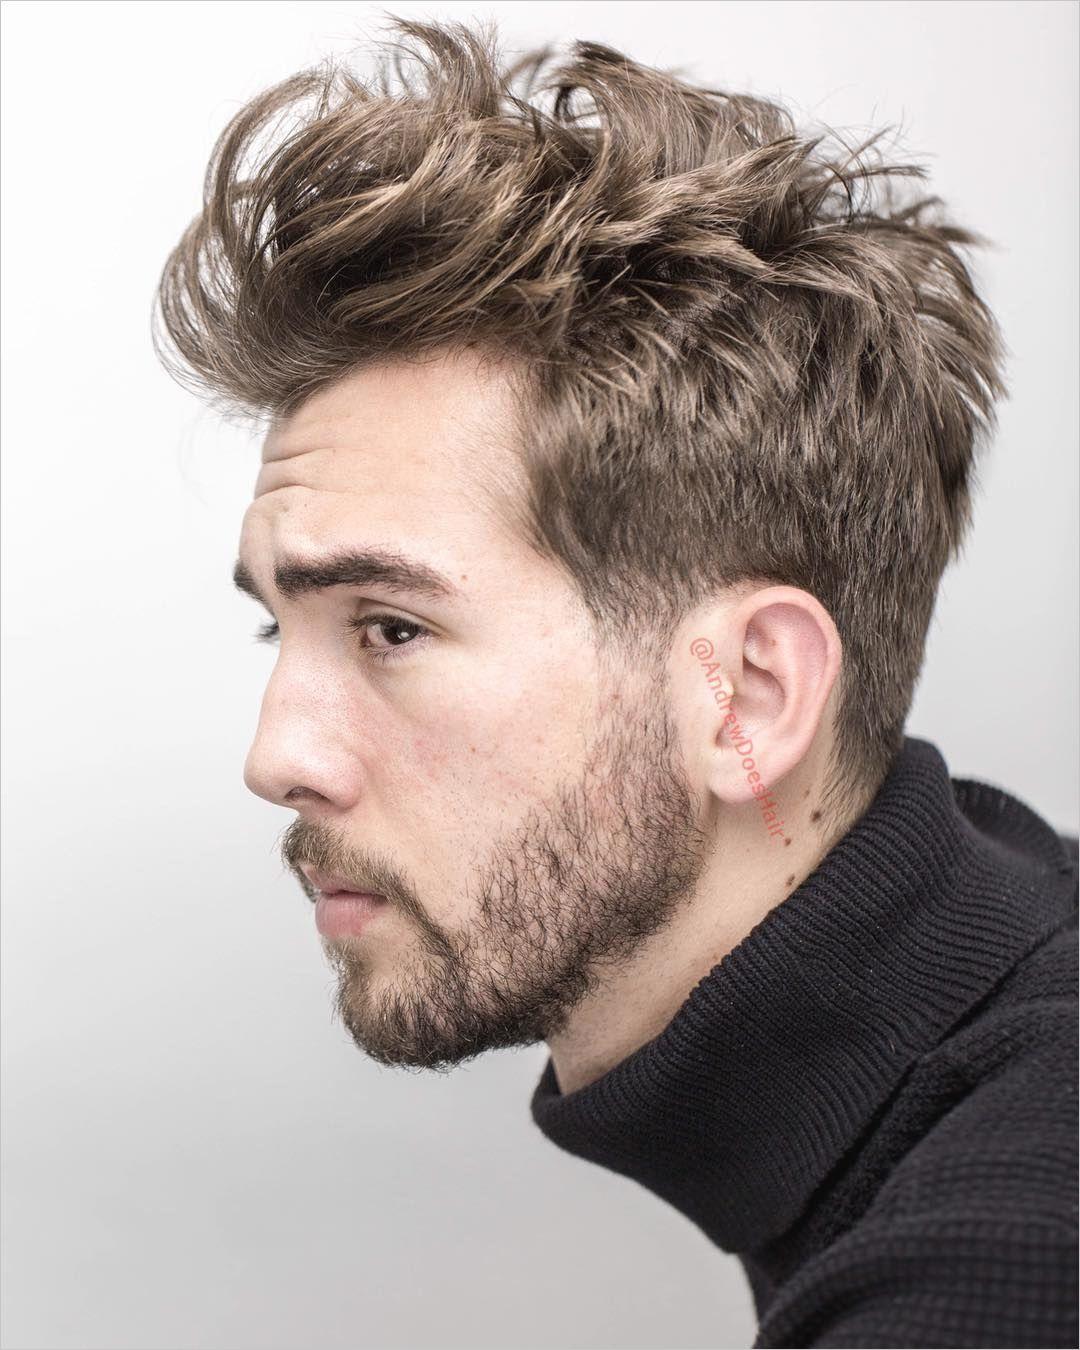 frisur tipps m舅ner | meilleure coiffure moderne